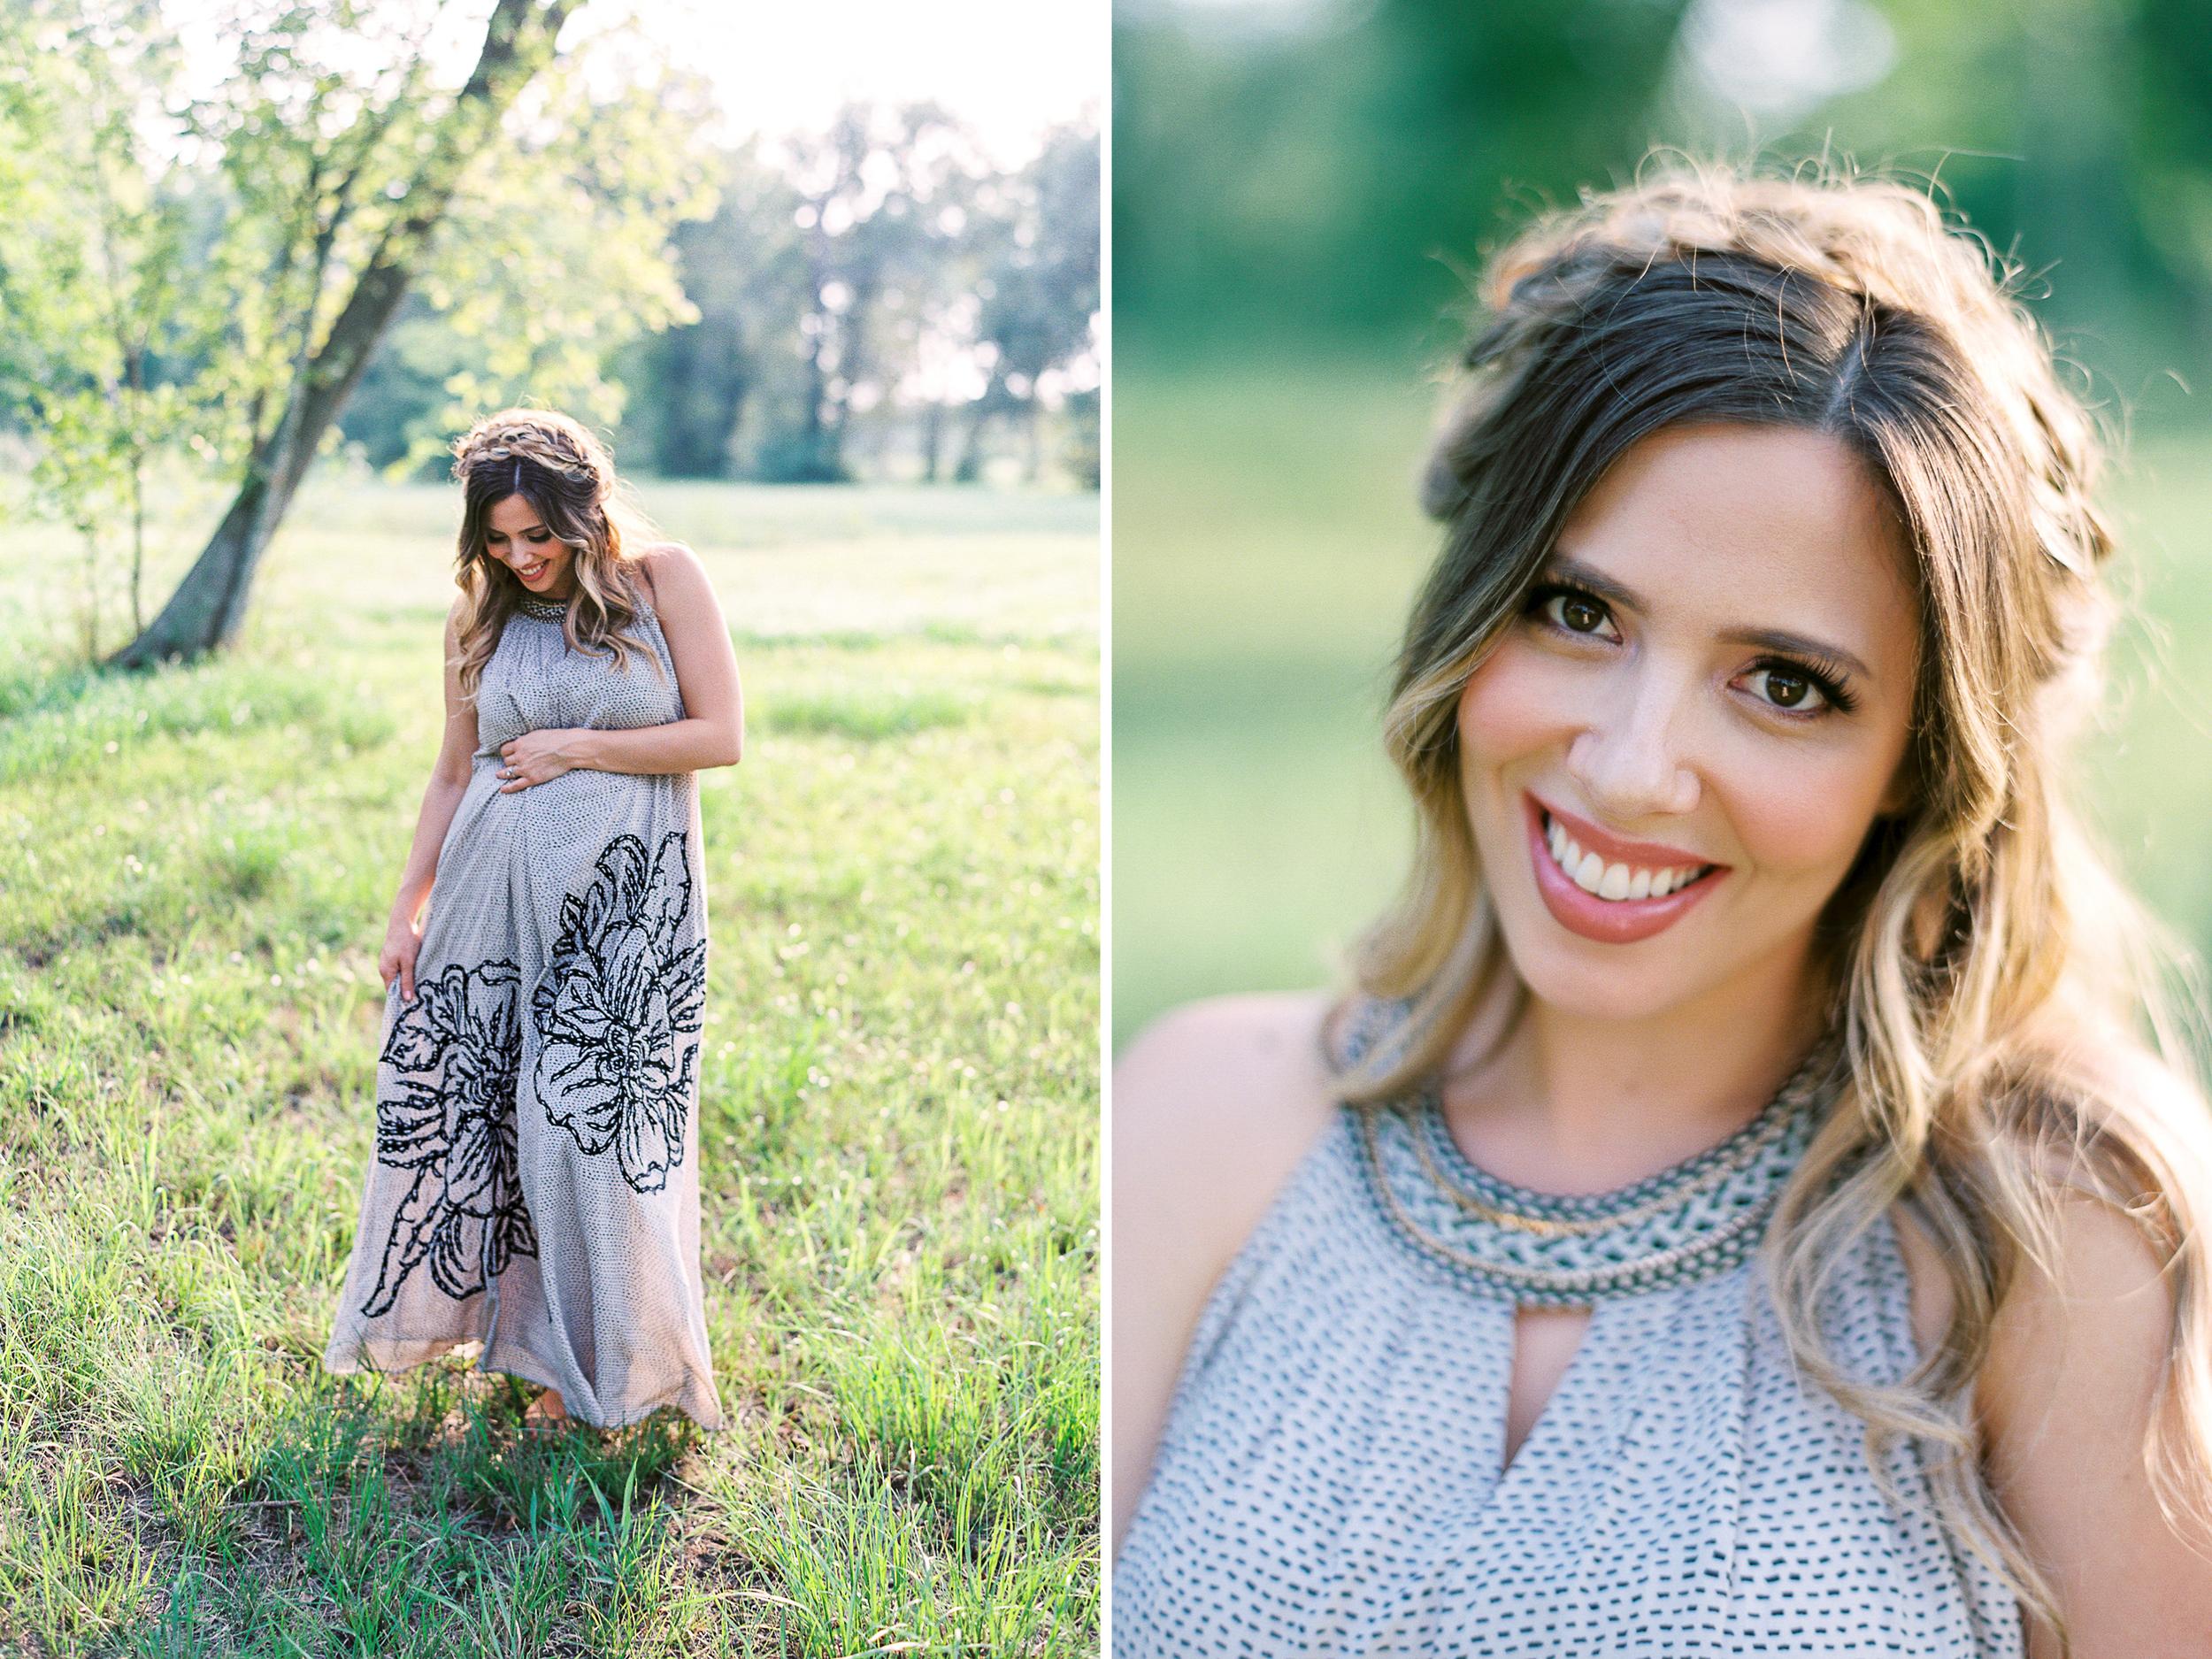 Dana-Fernandez-Photography-Houston-Maternity-Family-Portrait-Photographer-Film-107.jpg